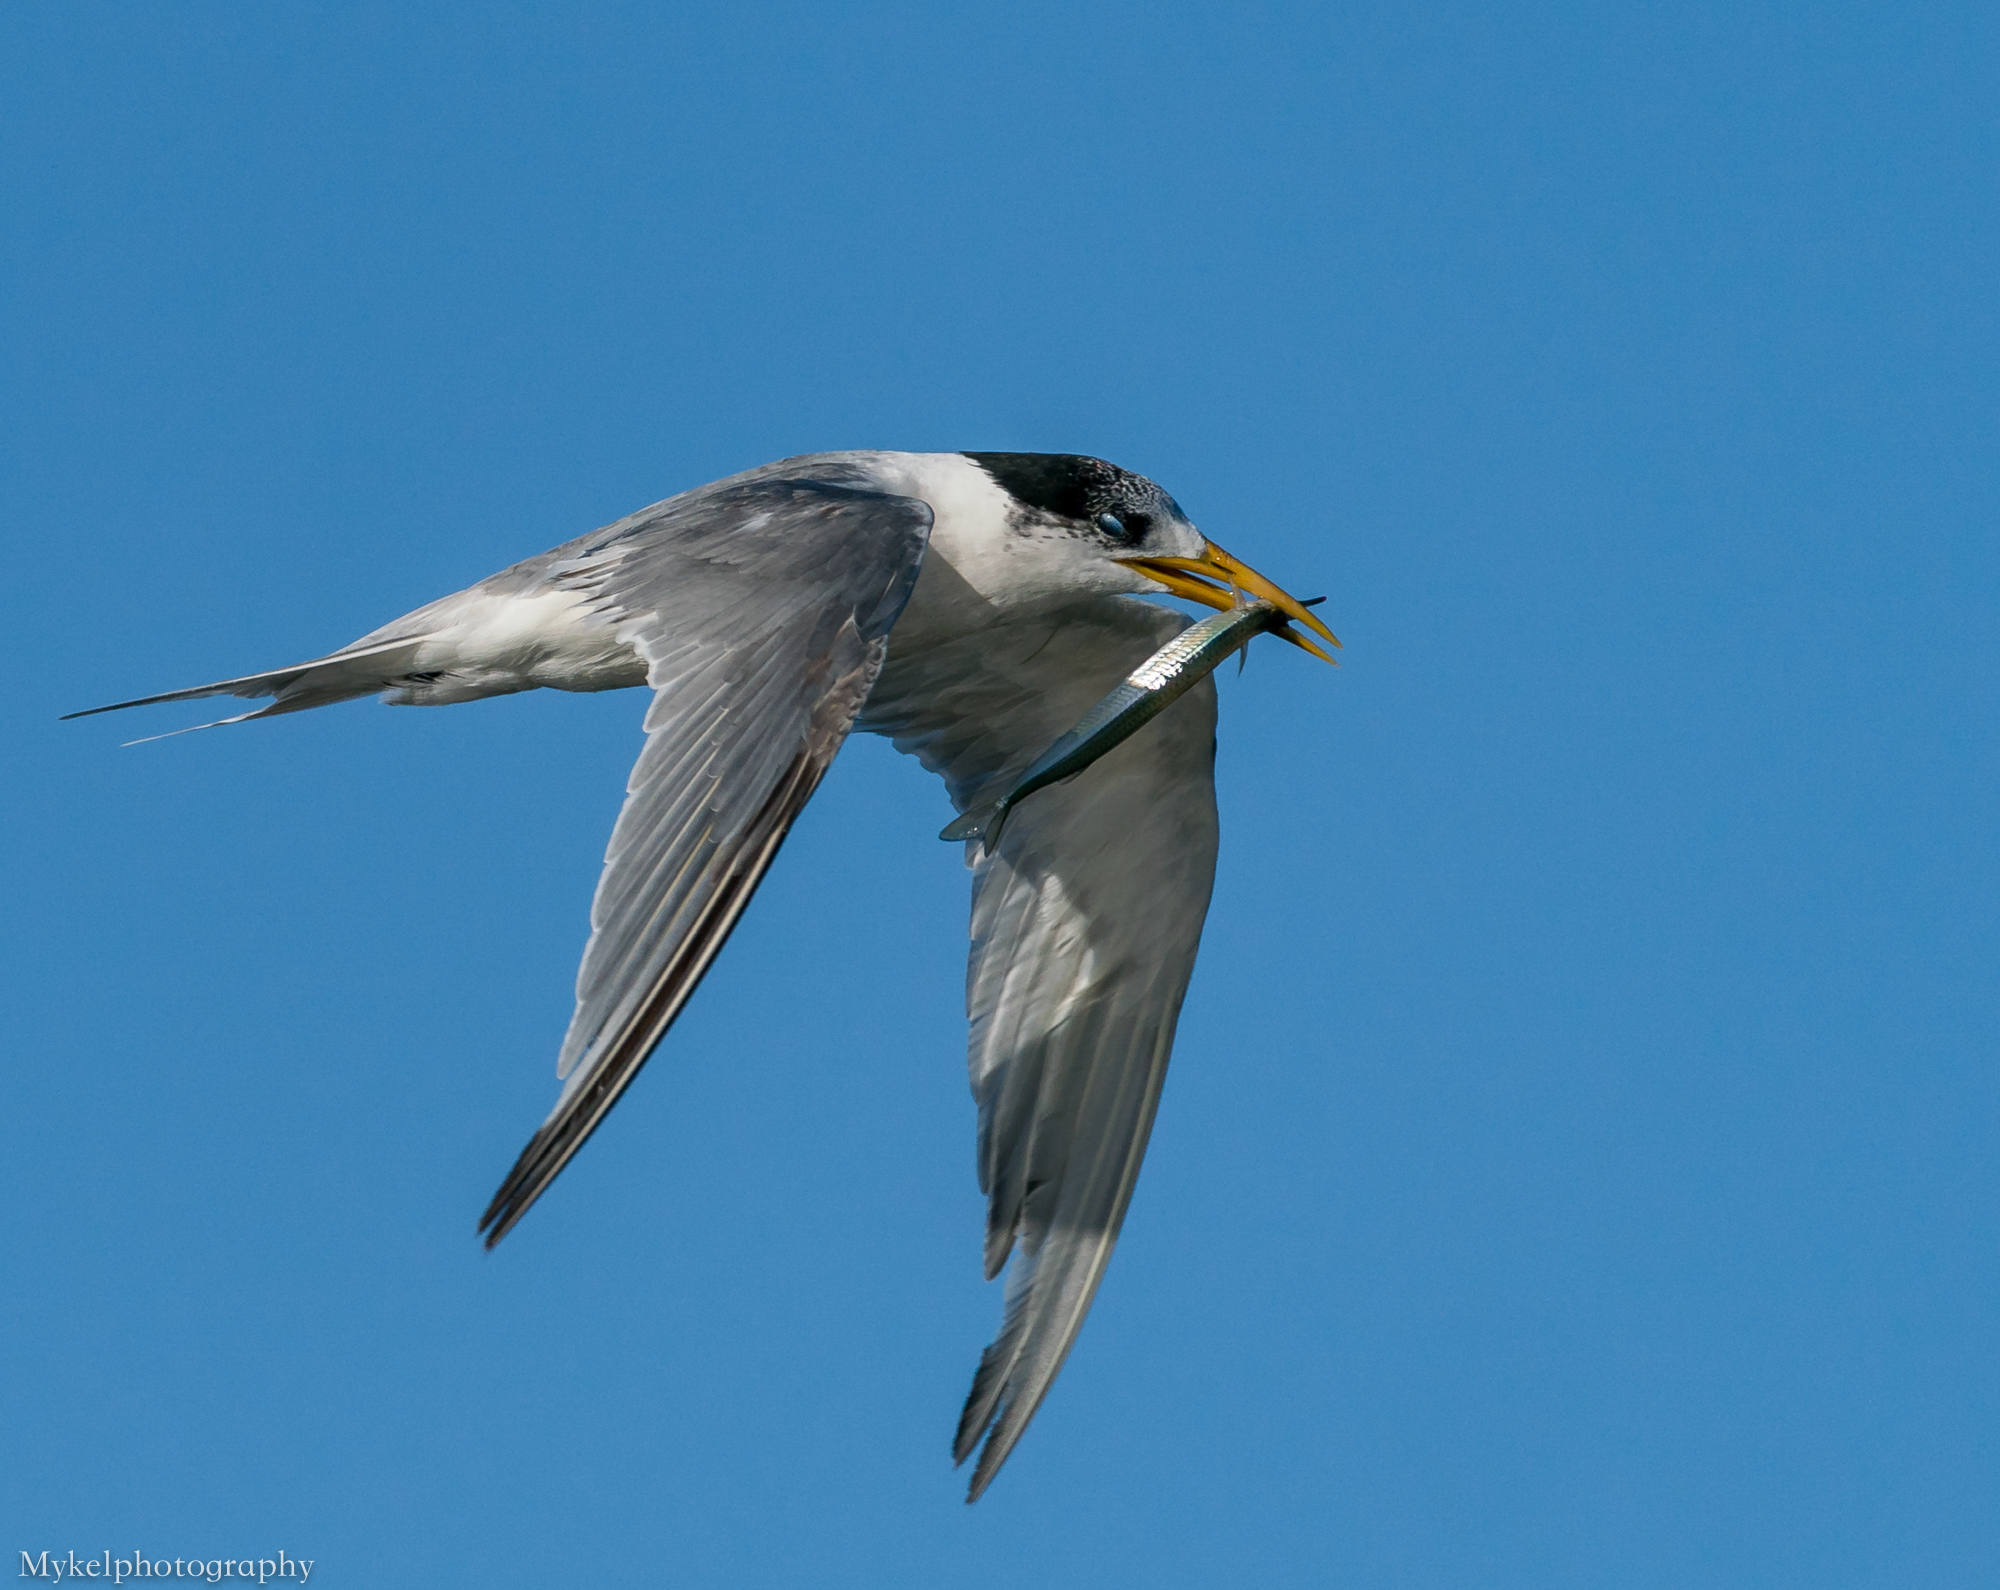 Crested Tern, Thalasseus bergii Laridae